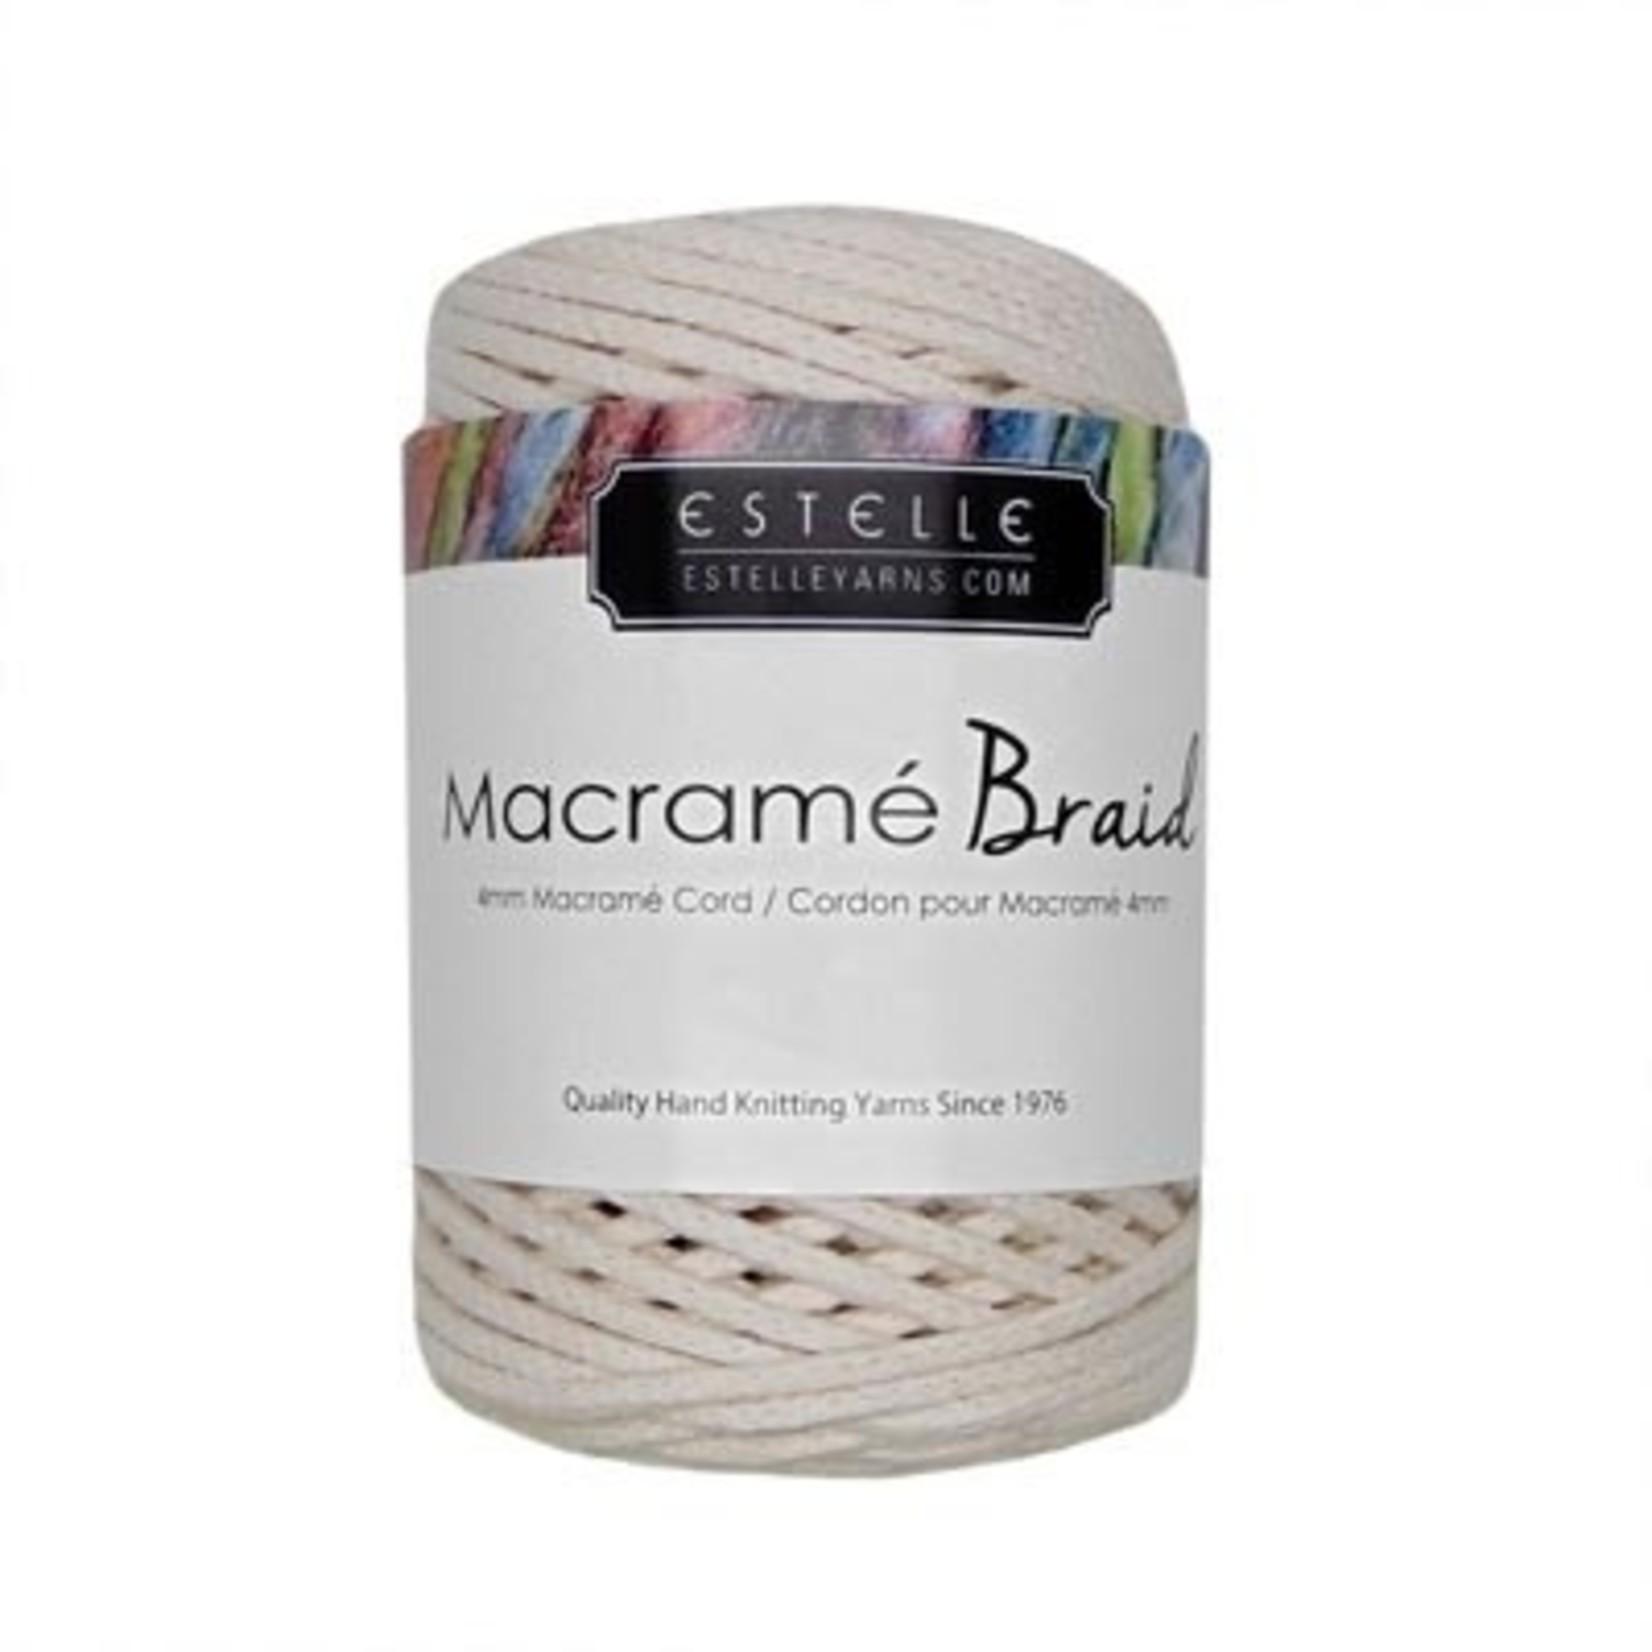 Estelle Macrame Braid by Estelle Yarns